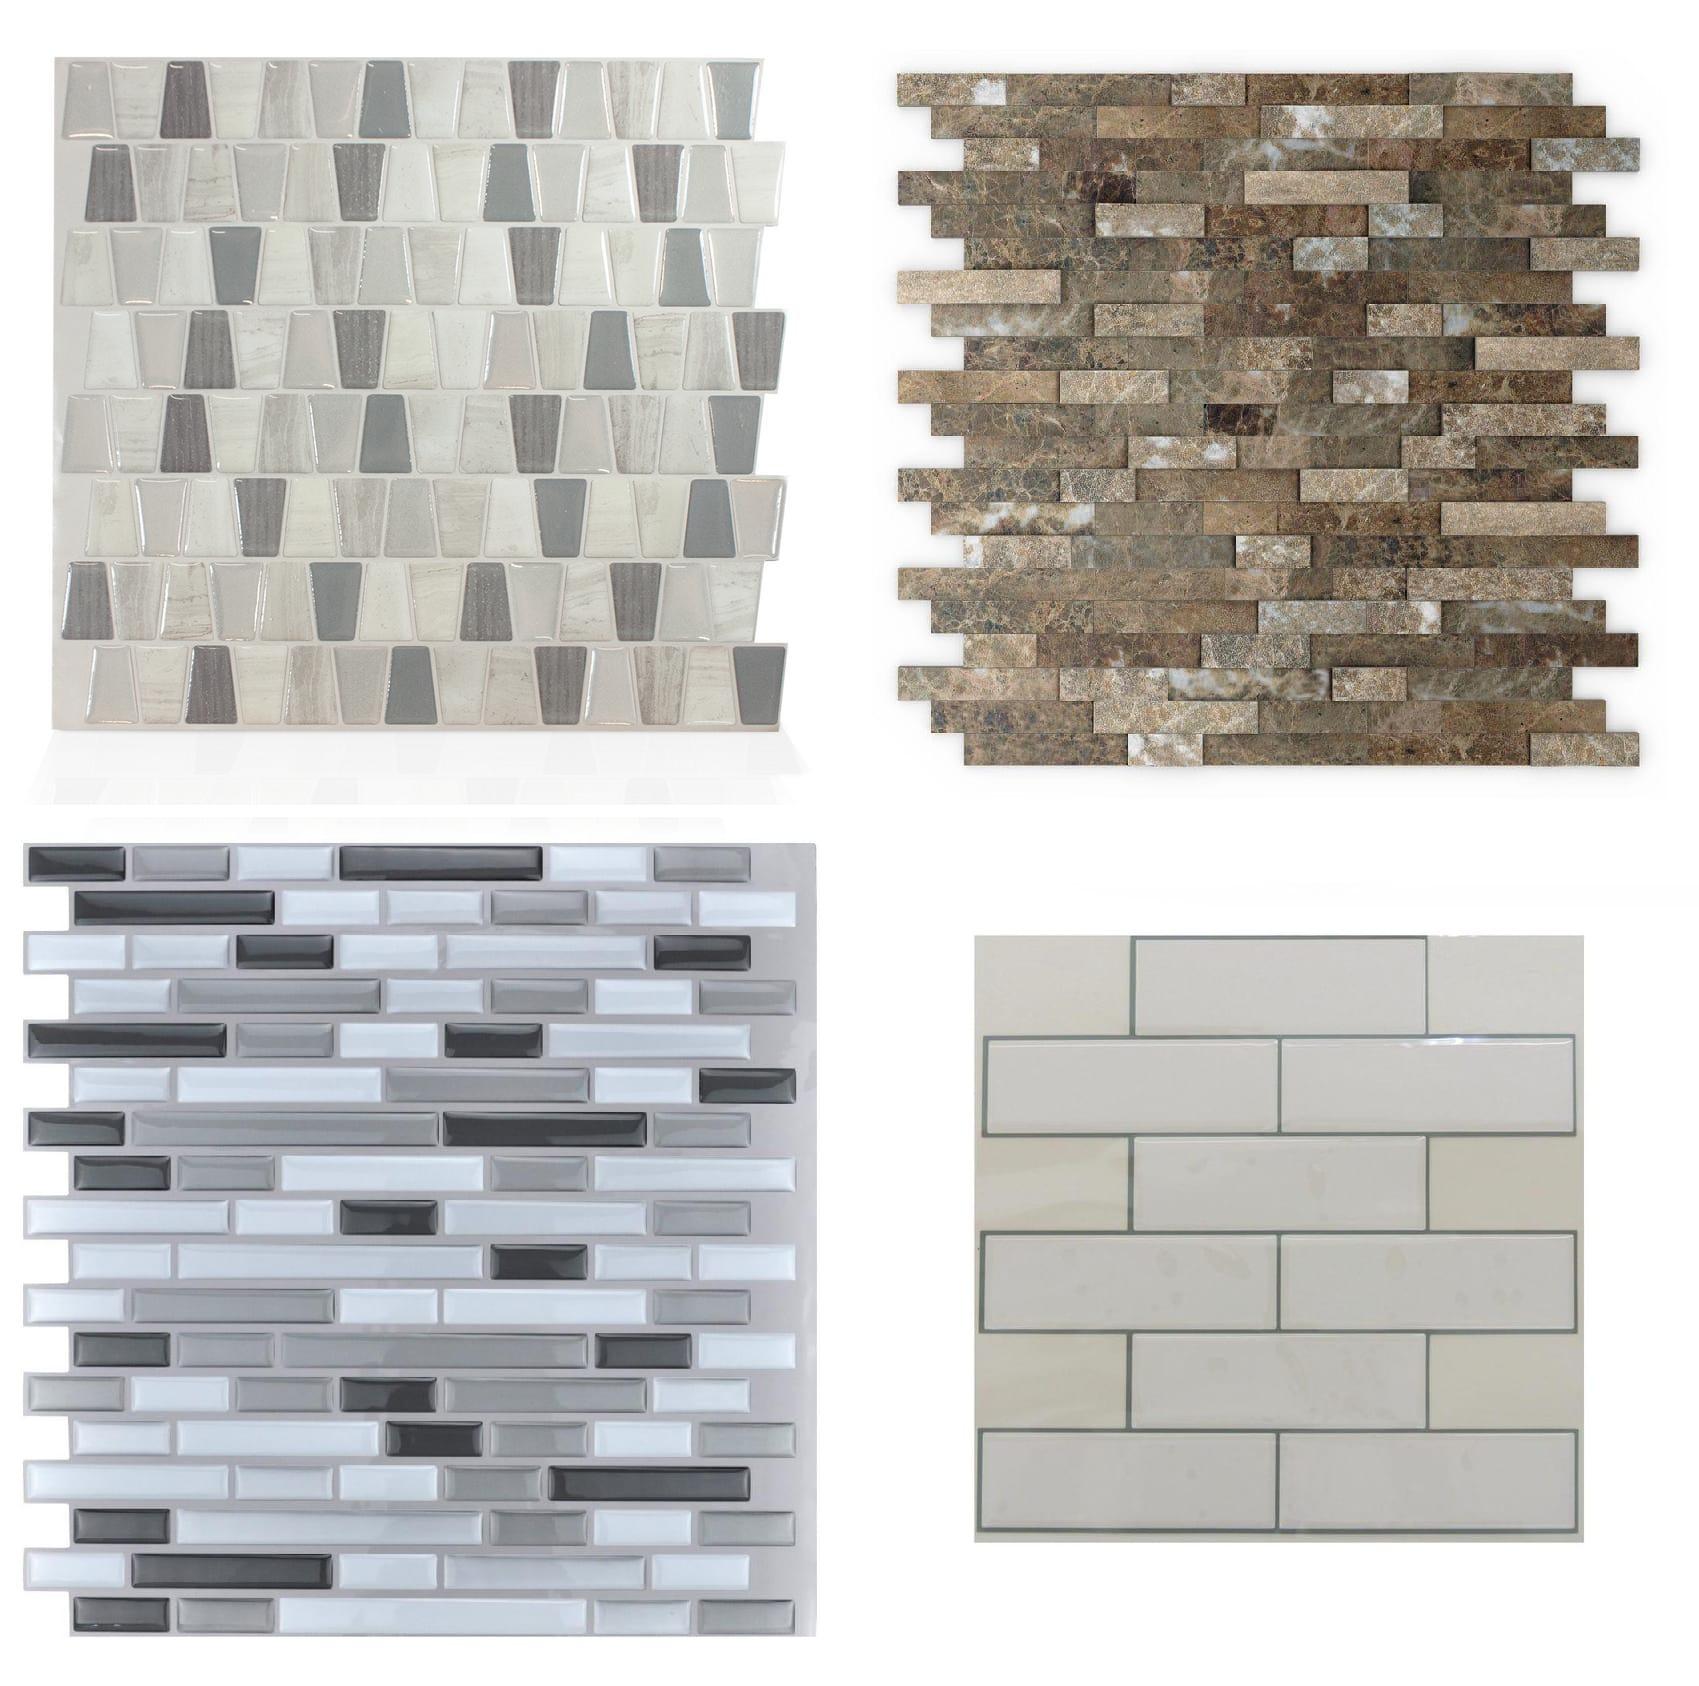 - Home Depot Takes 15% Off Peel And Stick Backsplash Tiles Via